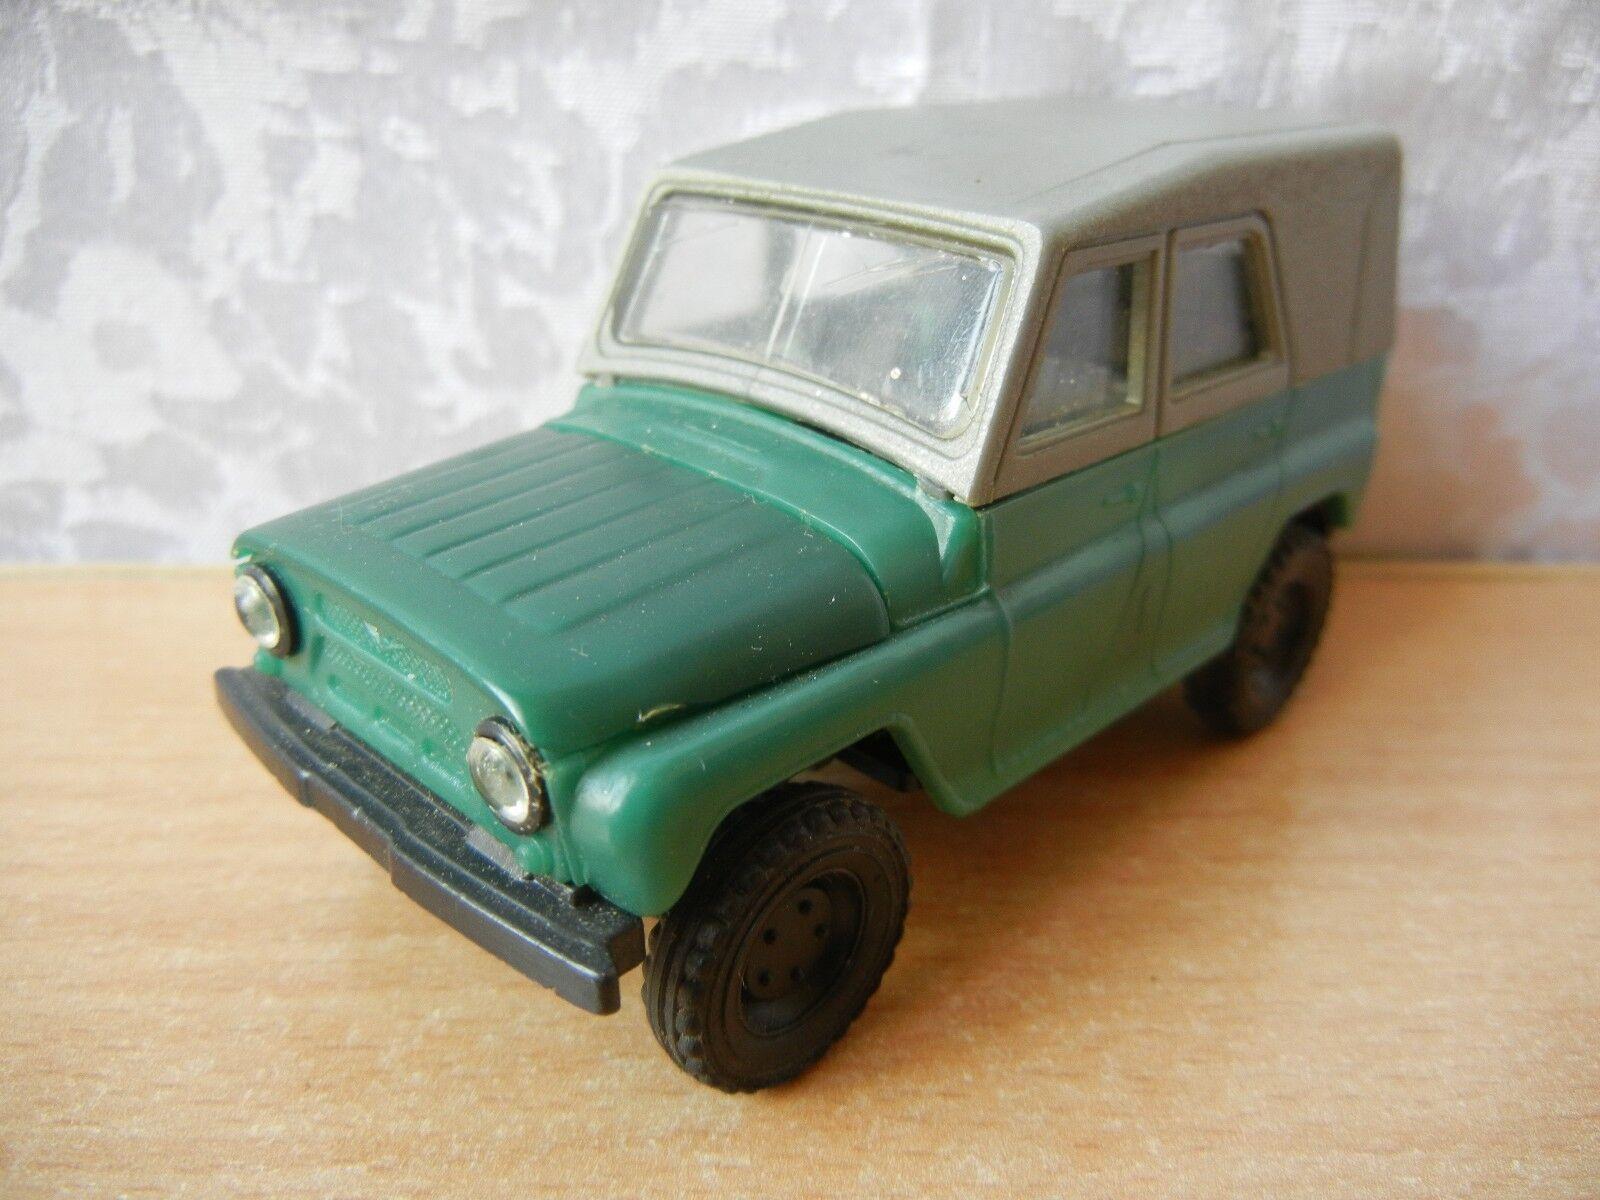 Vintage toy soviet car UAZ 469 M plastic model Military equipment USSR 1 43